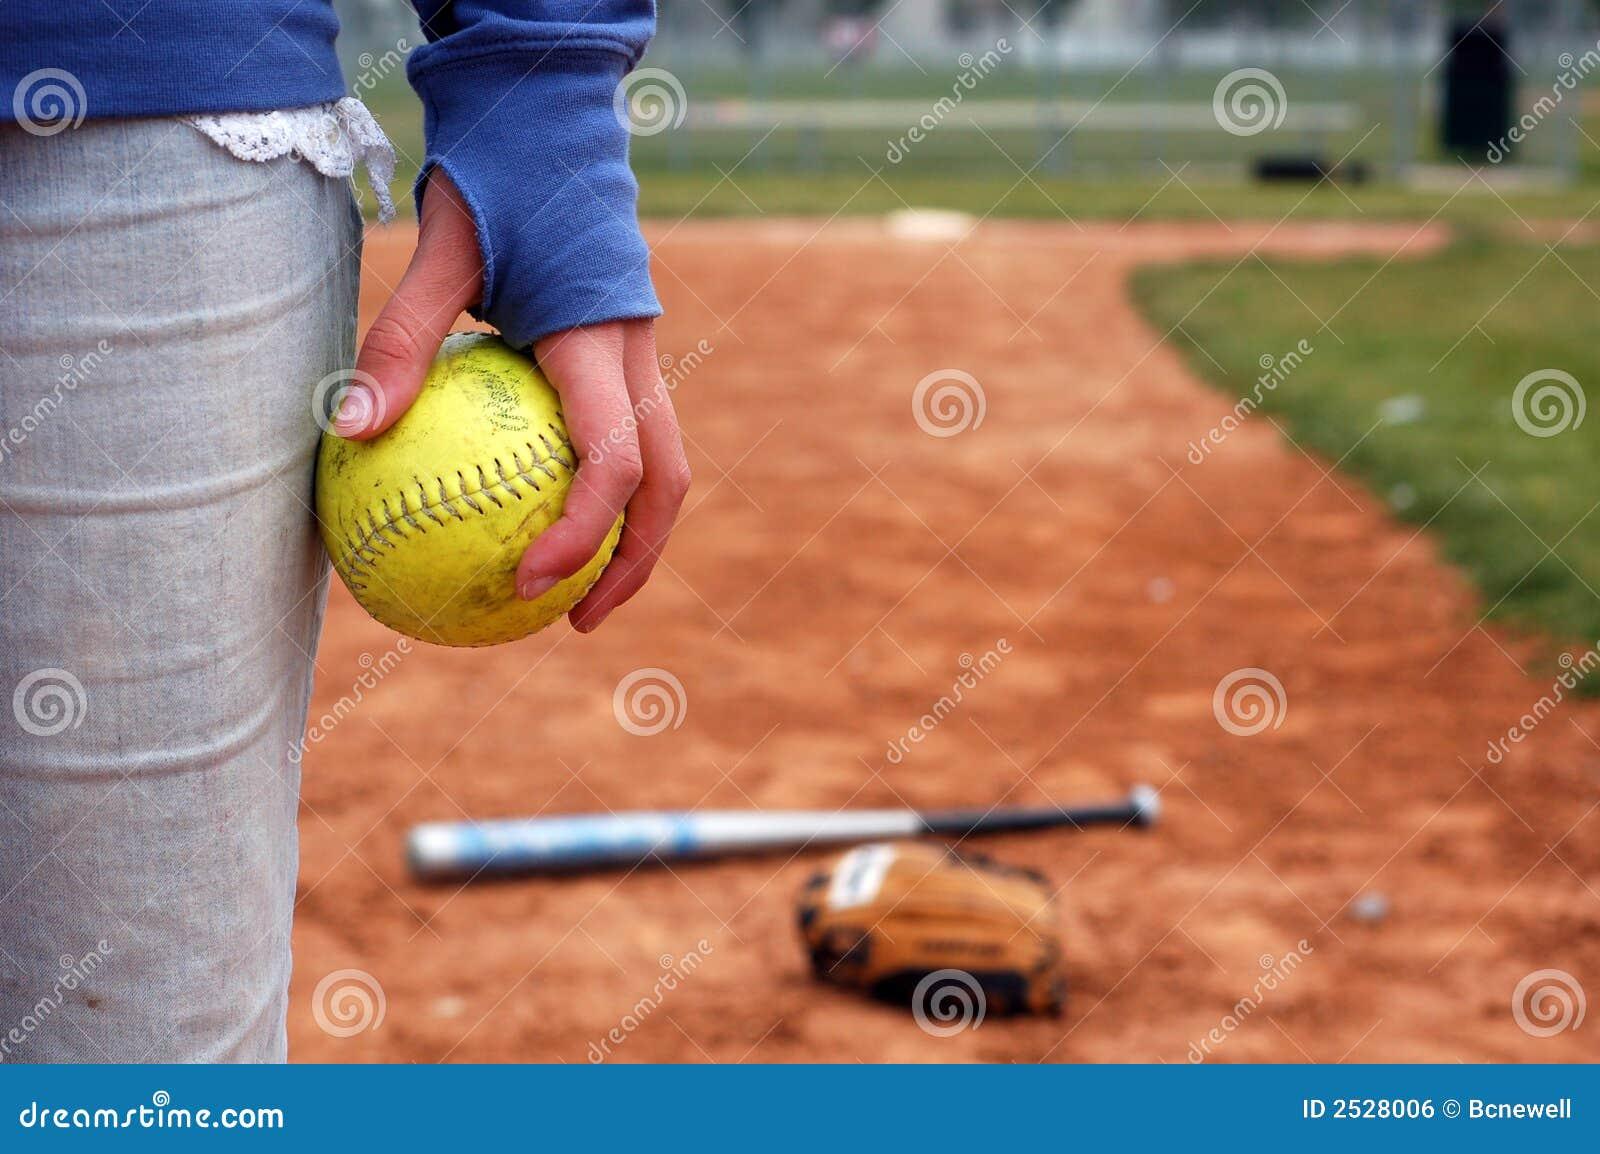 A Girl and Her Softball, Glove